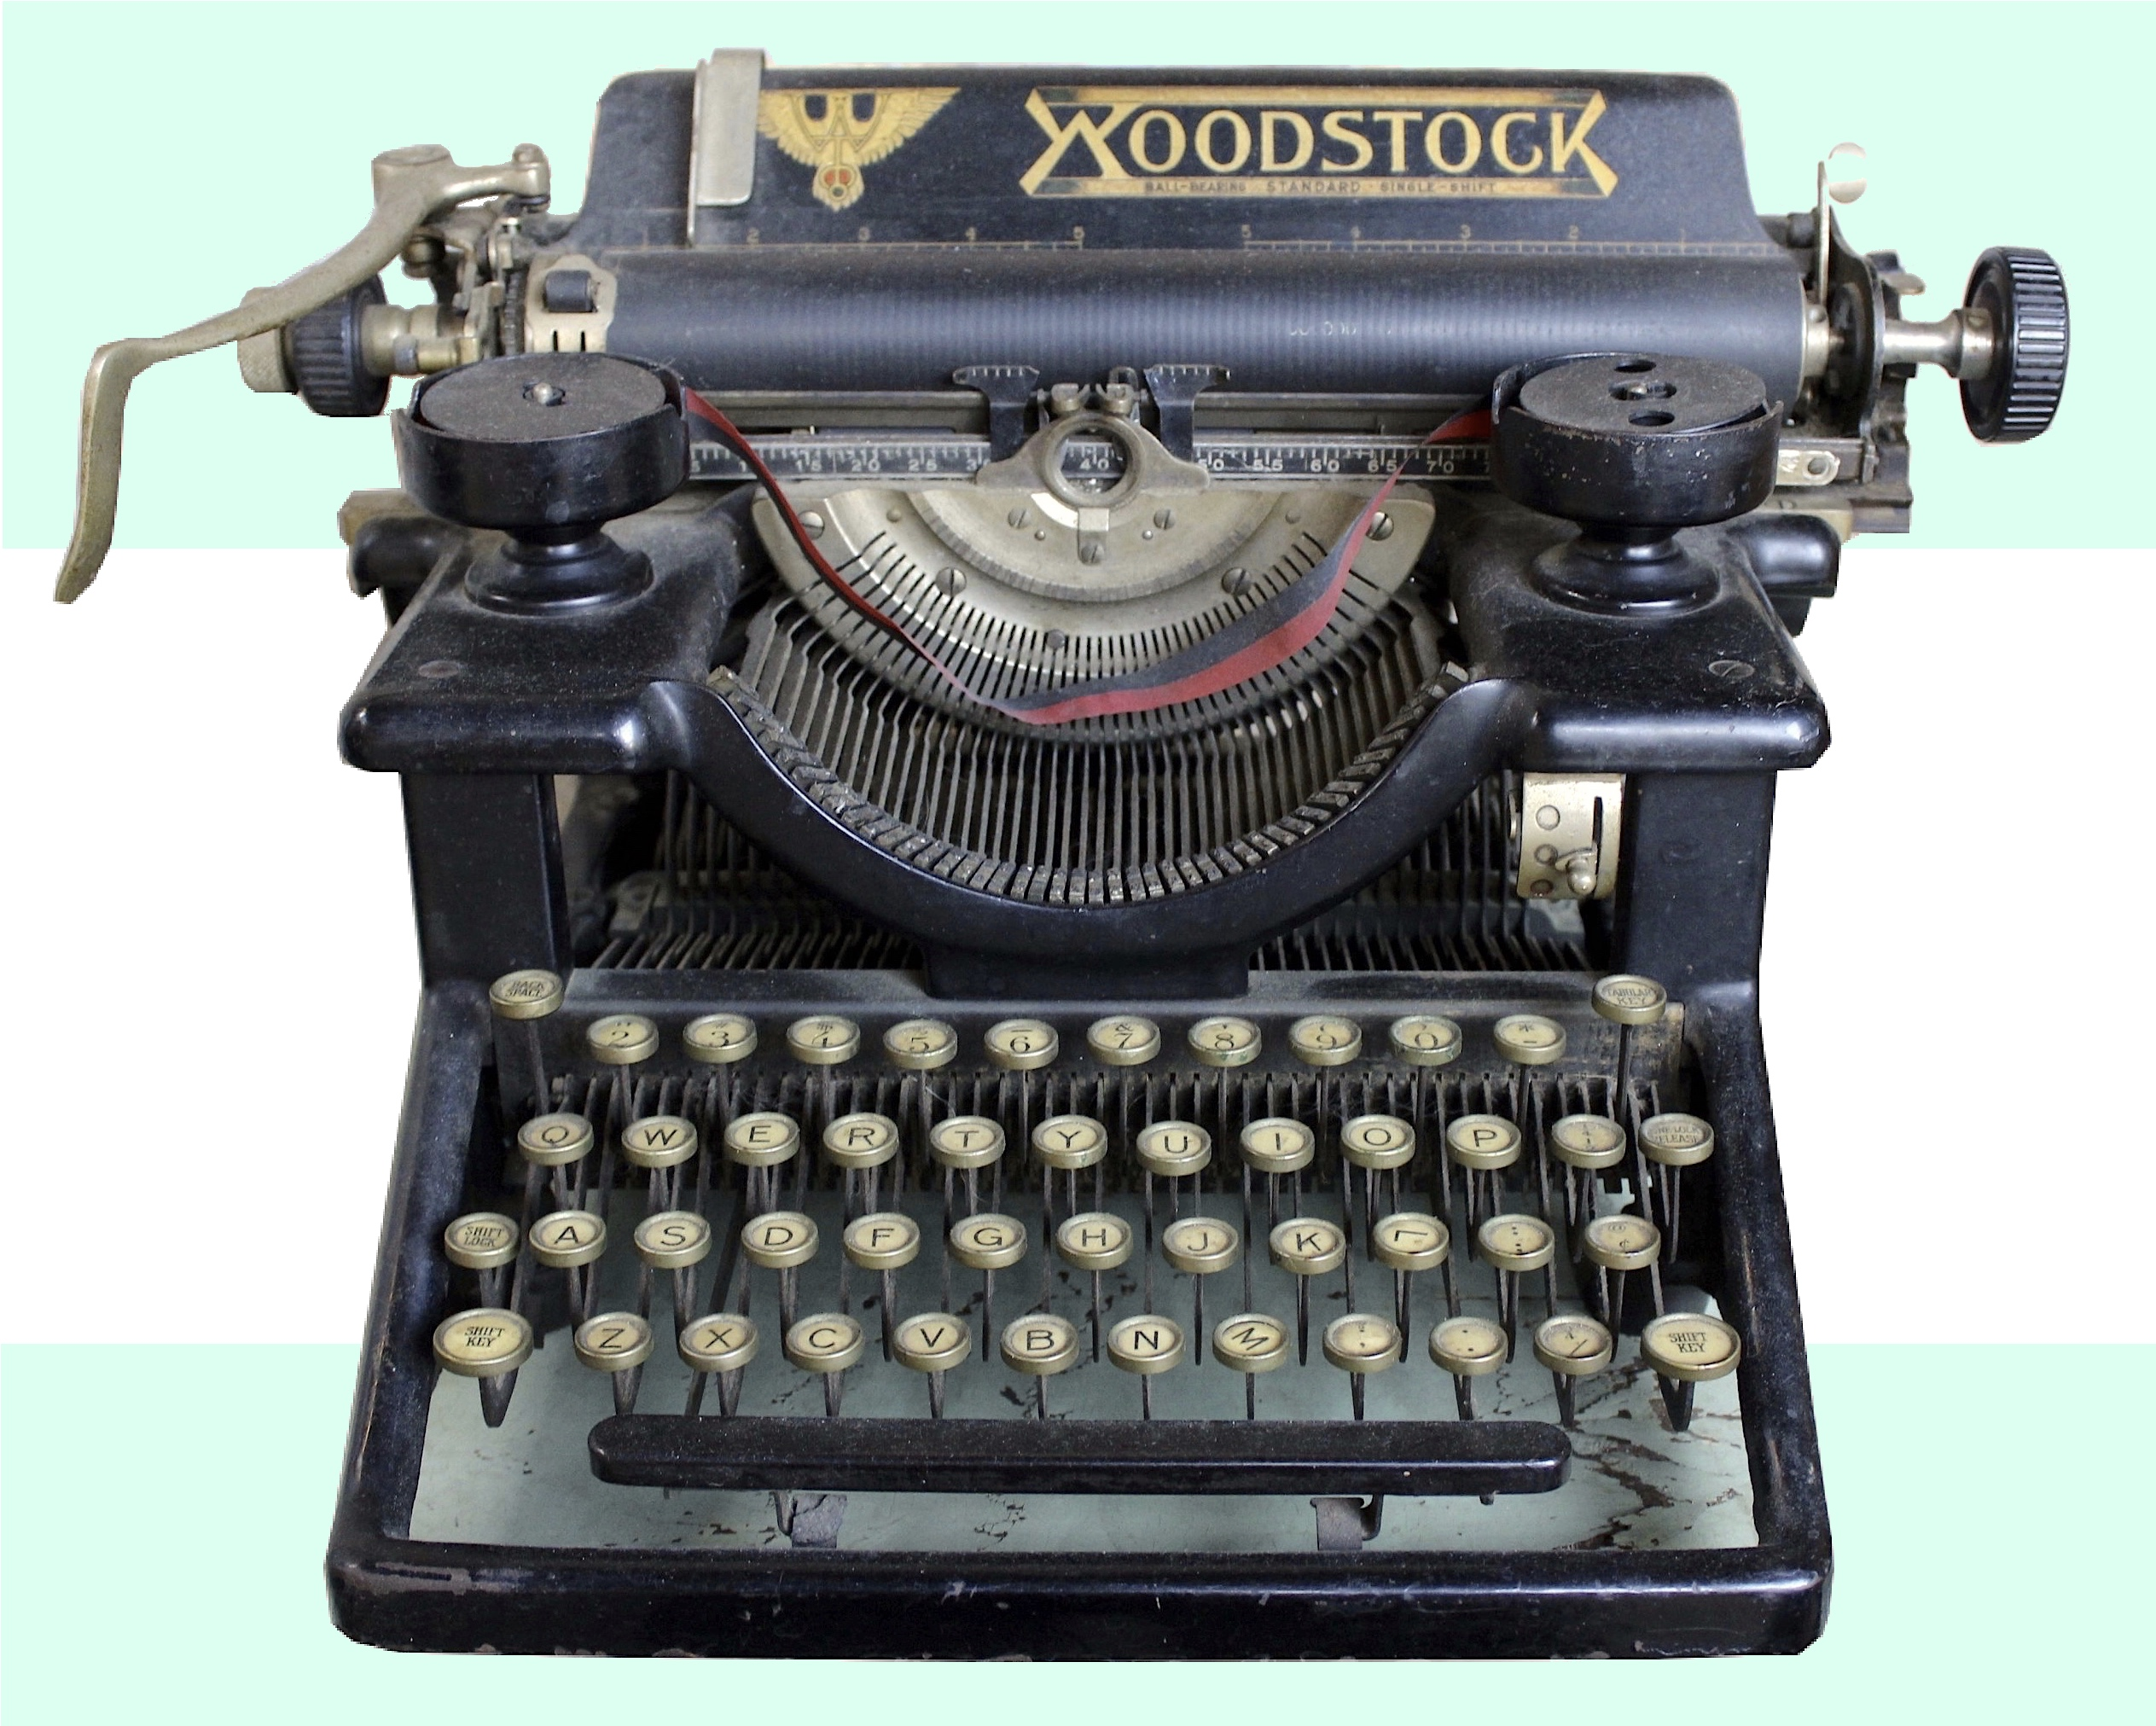 Woodstock Typewriter Co., est. 1907